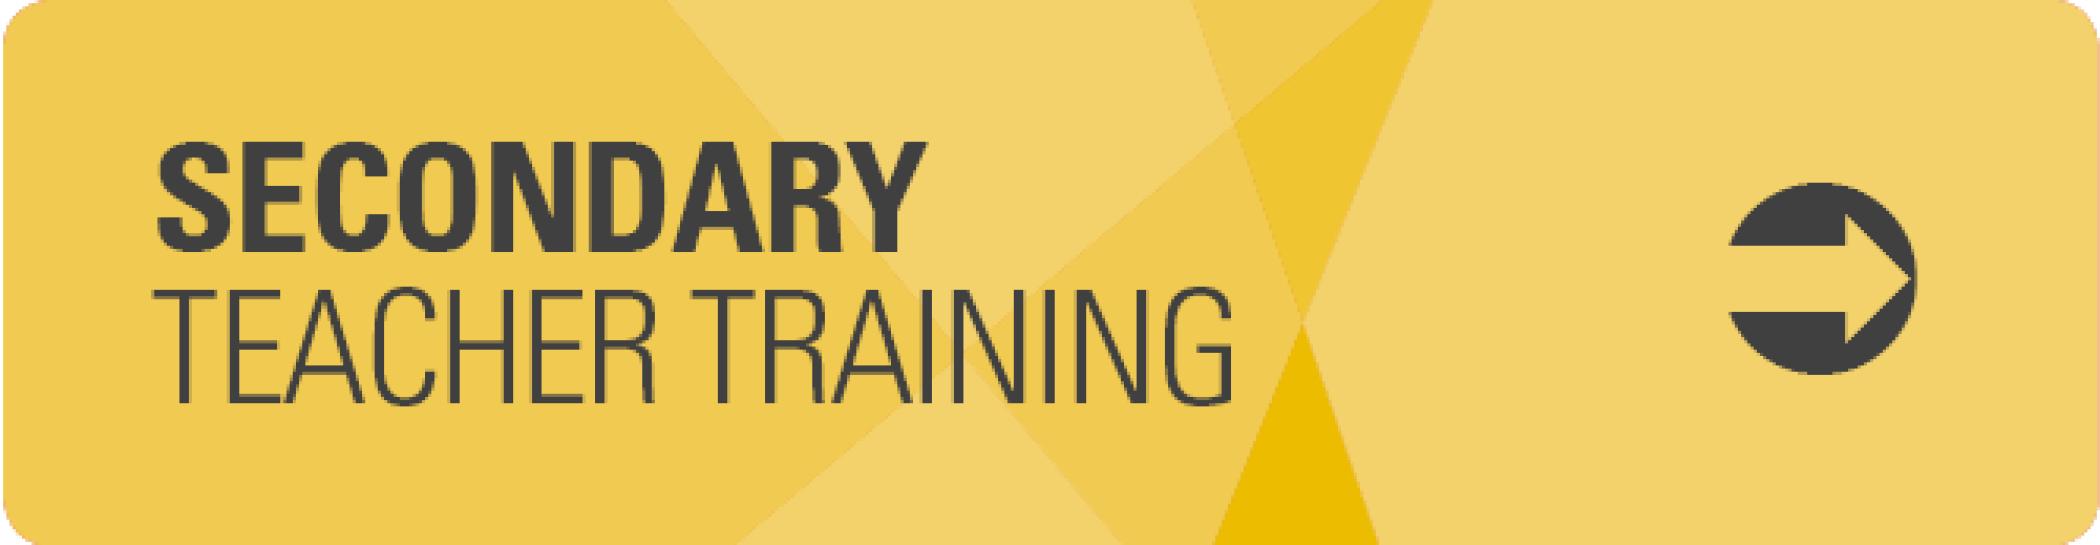 Secondary School Training